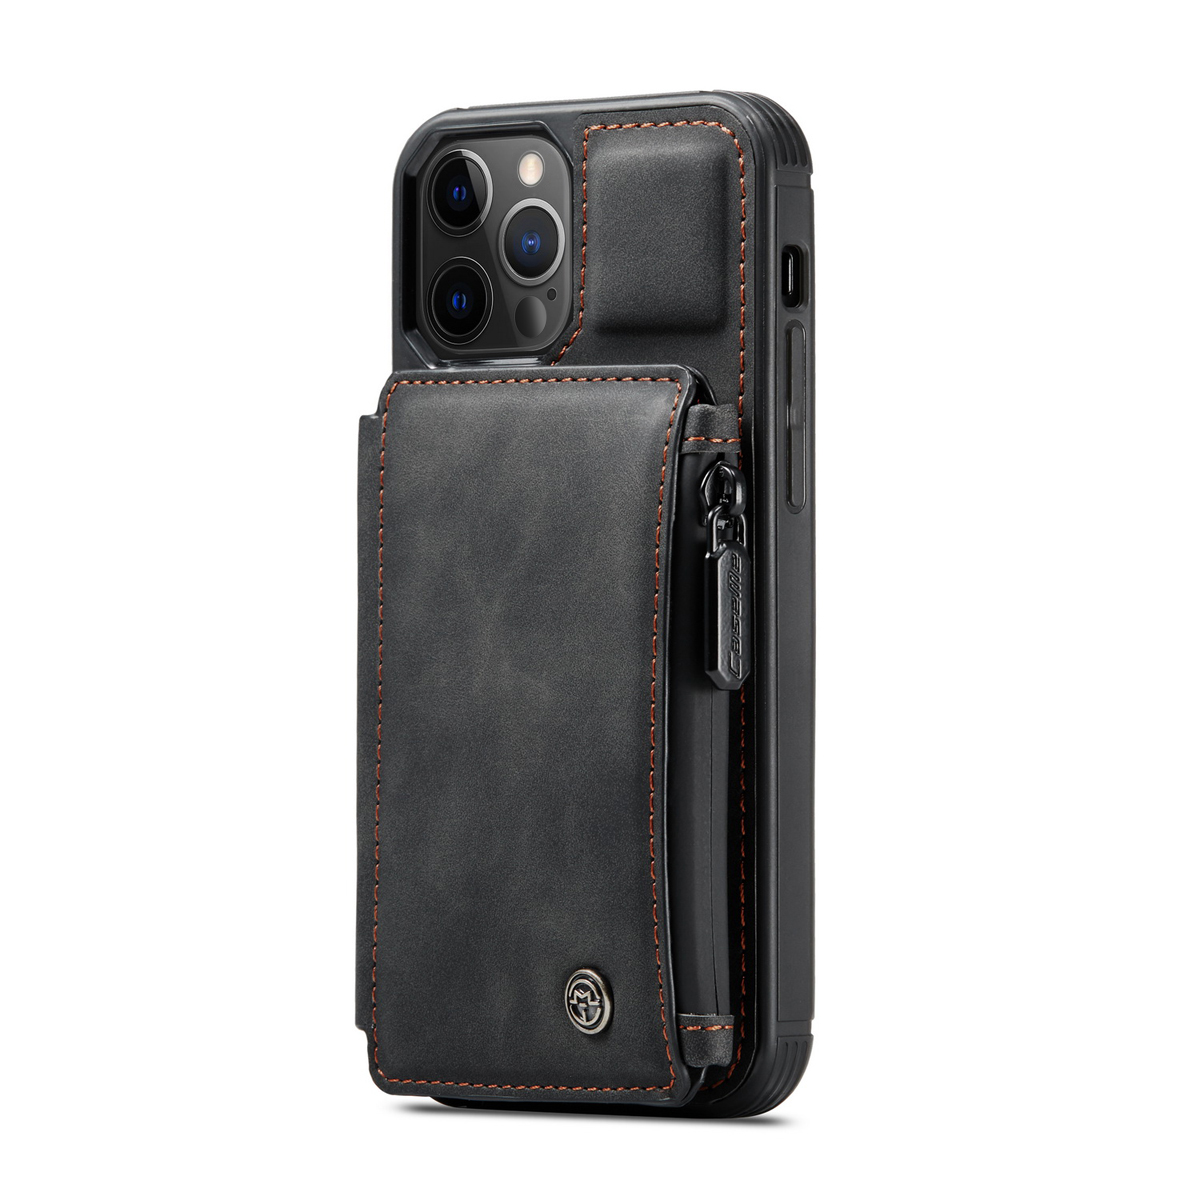 CaseMe C20 Series läderfodral till iPhone 12 Mini, svart